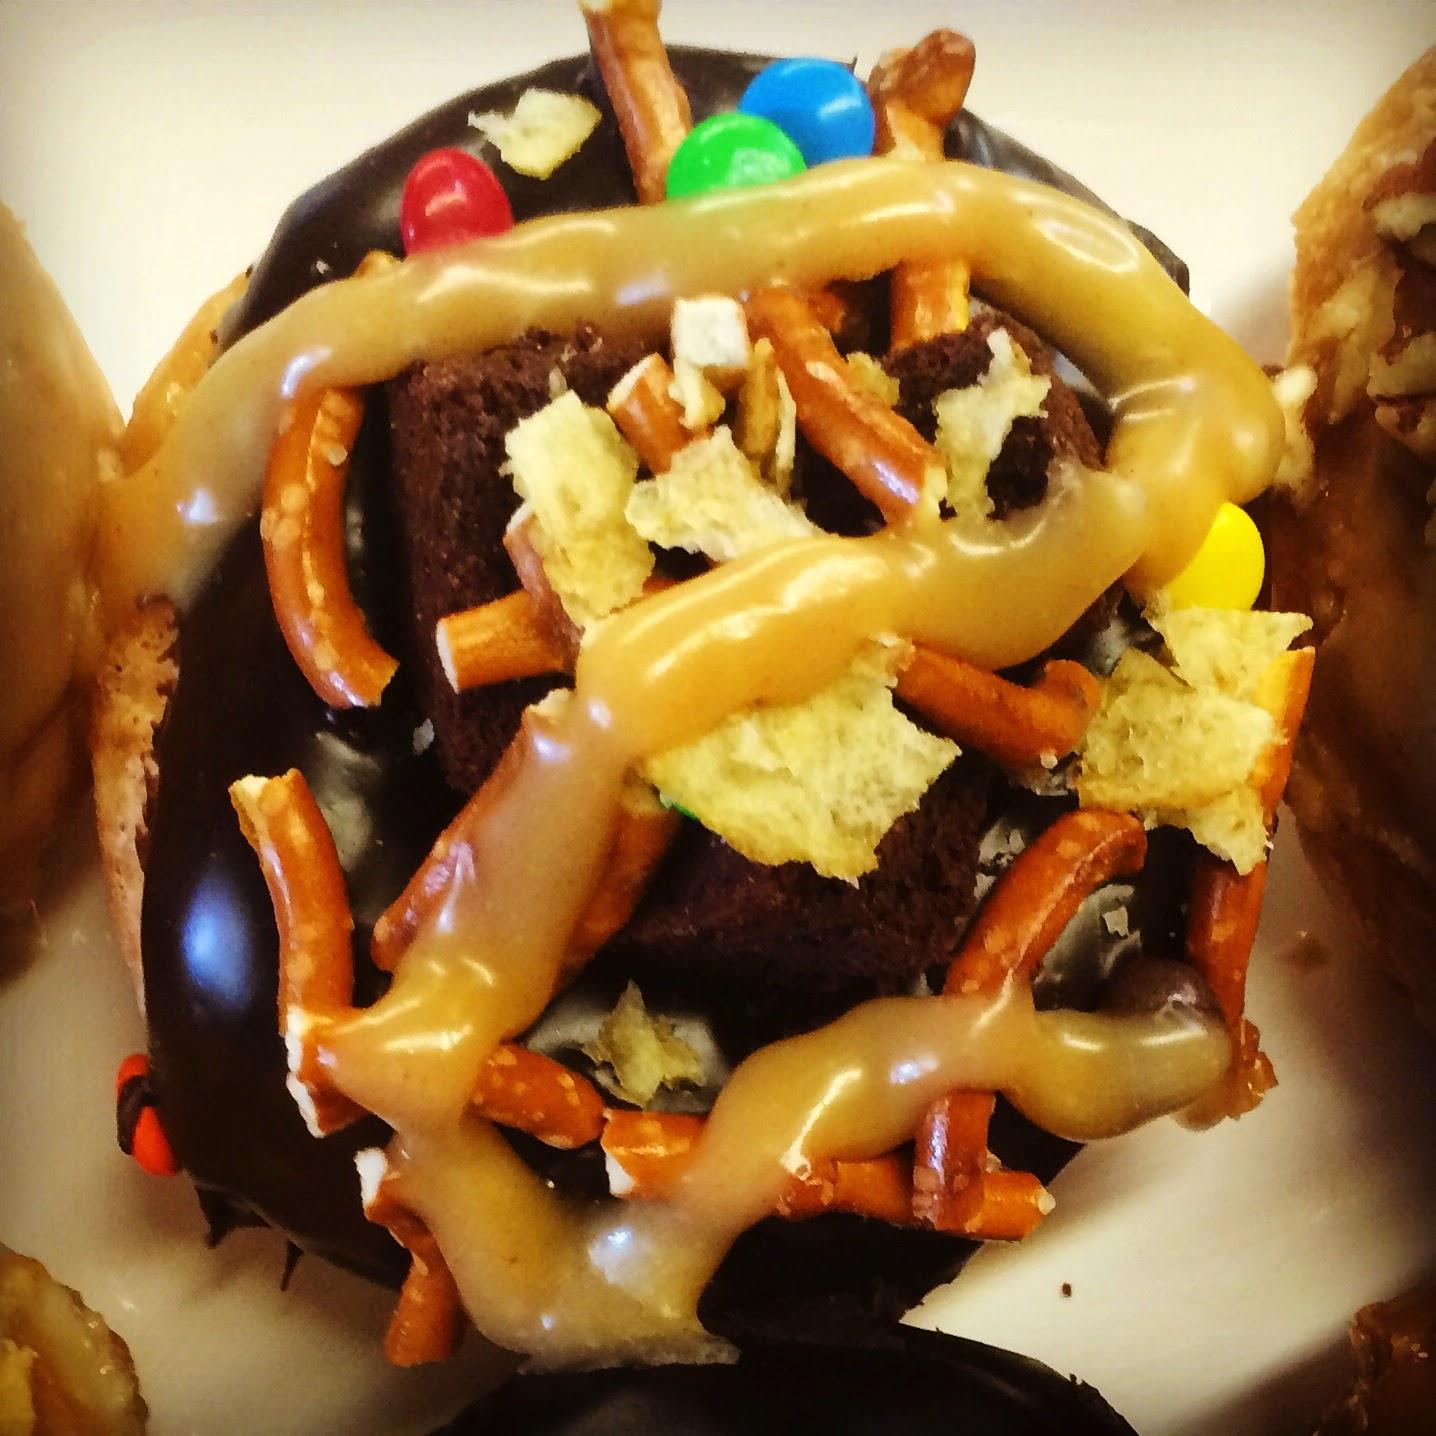 Sunday Doughnuts: Game Day Doughnuts